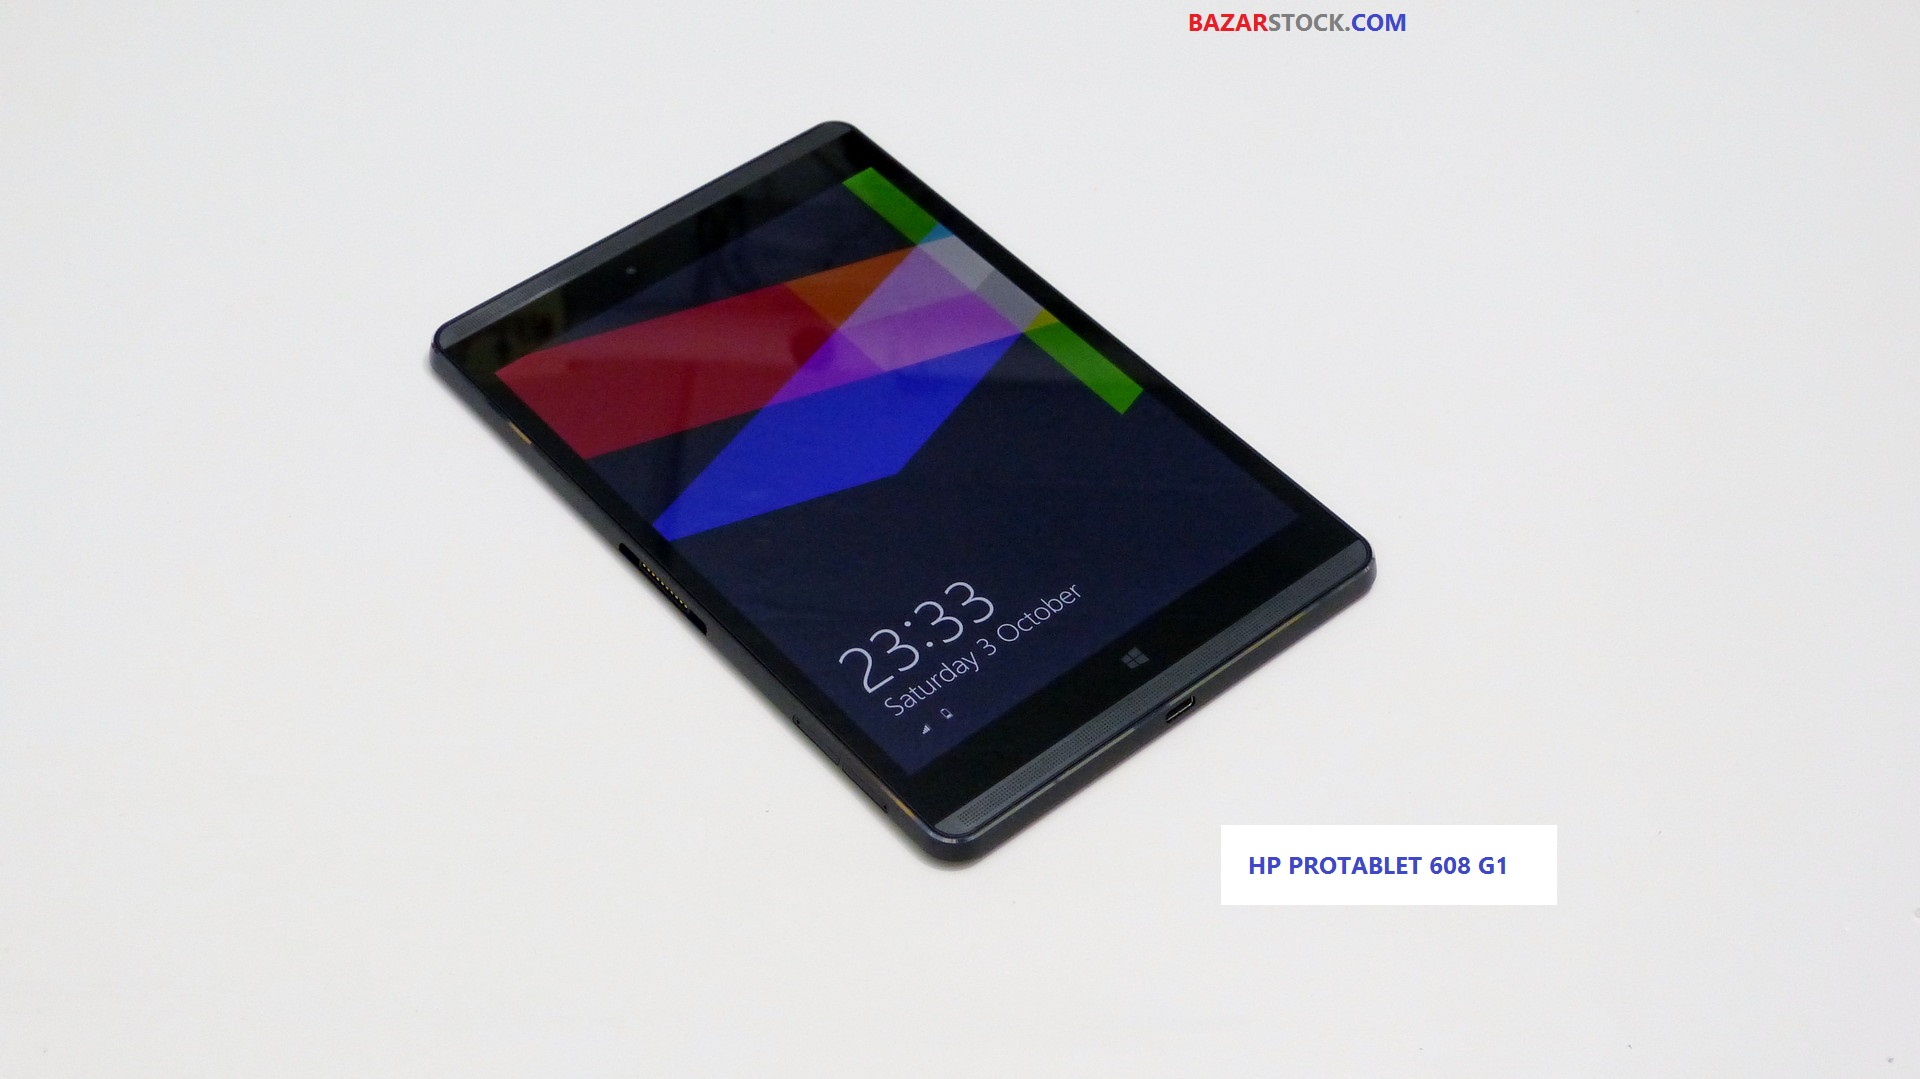 تبلت ویندوزی HP PROTABLET 608 G1